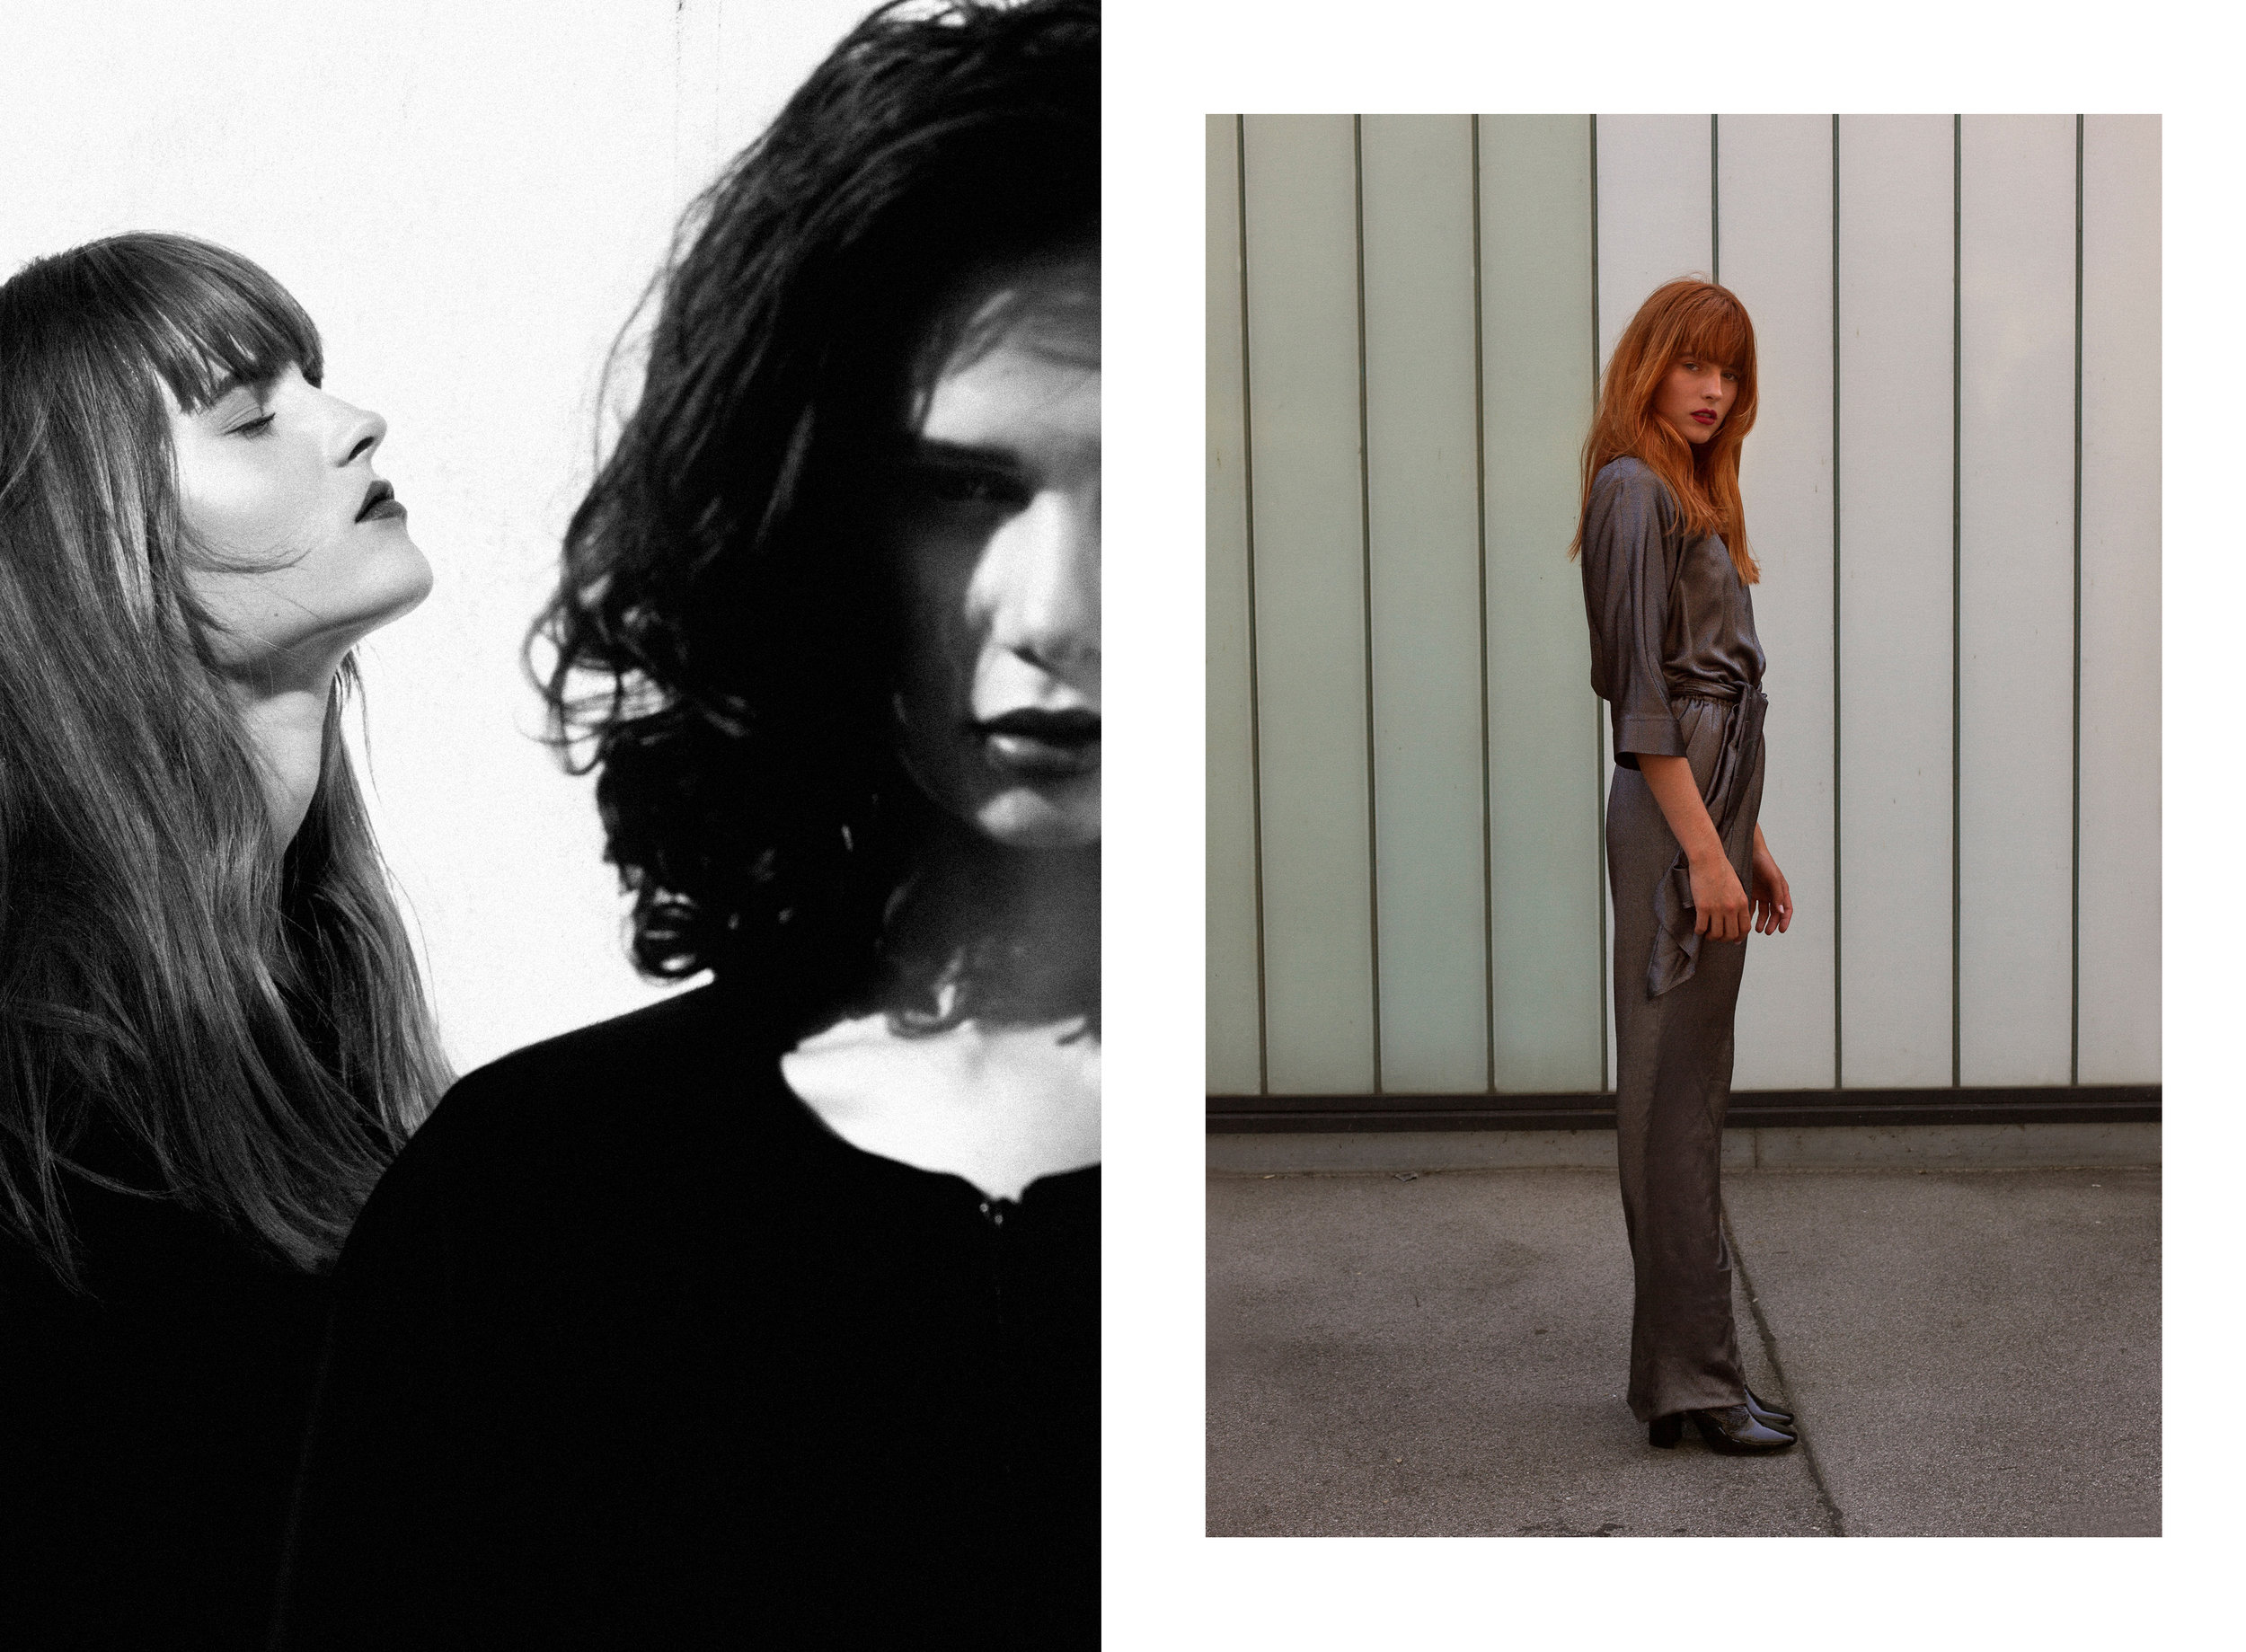 Left / Dress: Natalie Unger  Right / Dress: Maurizio Giambra